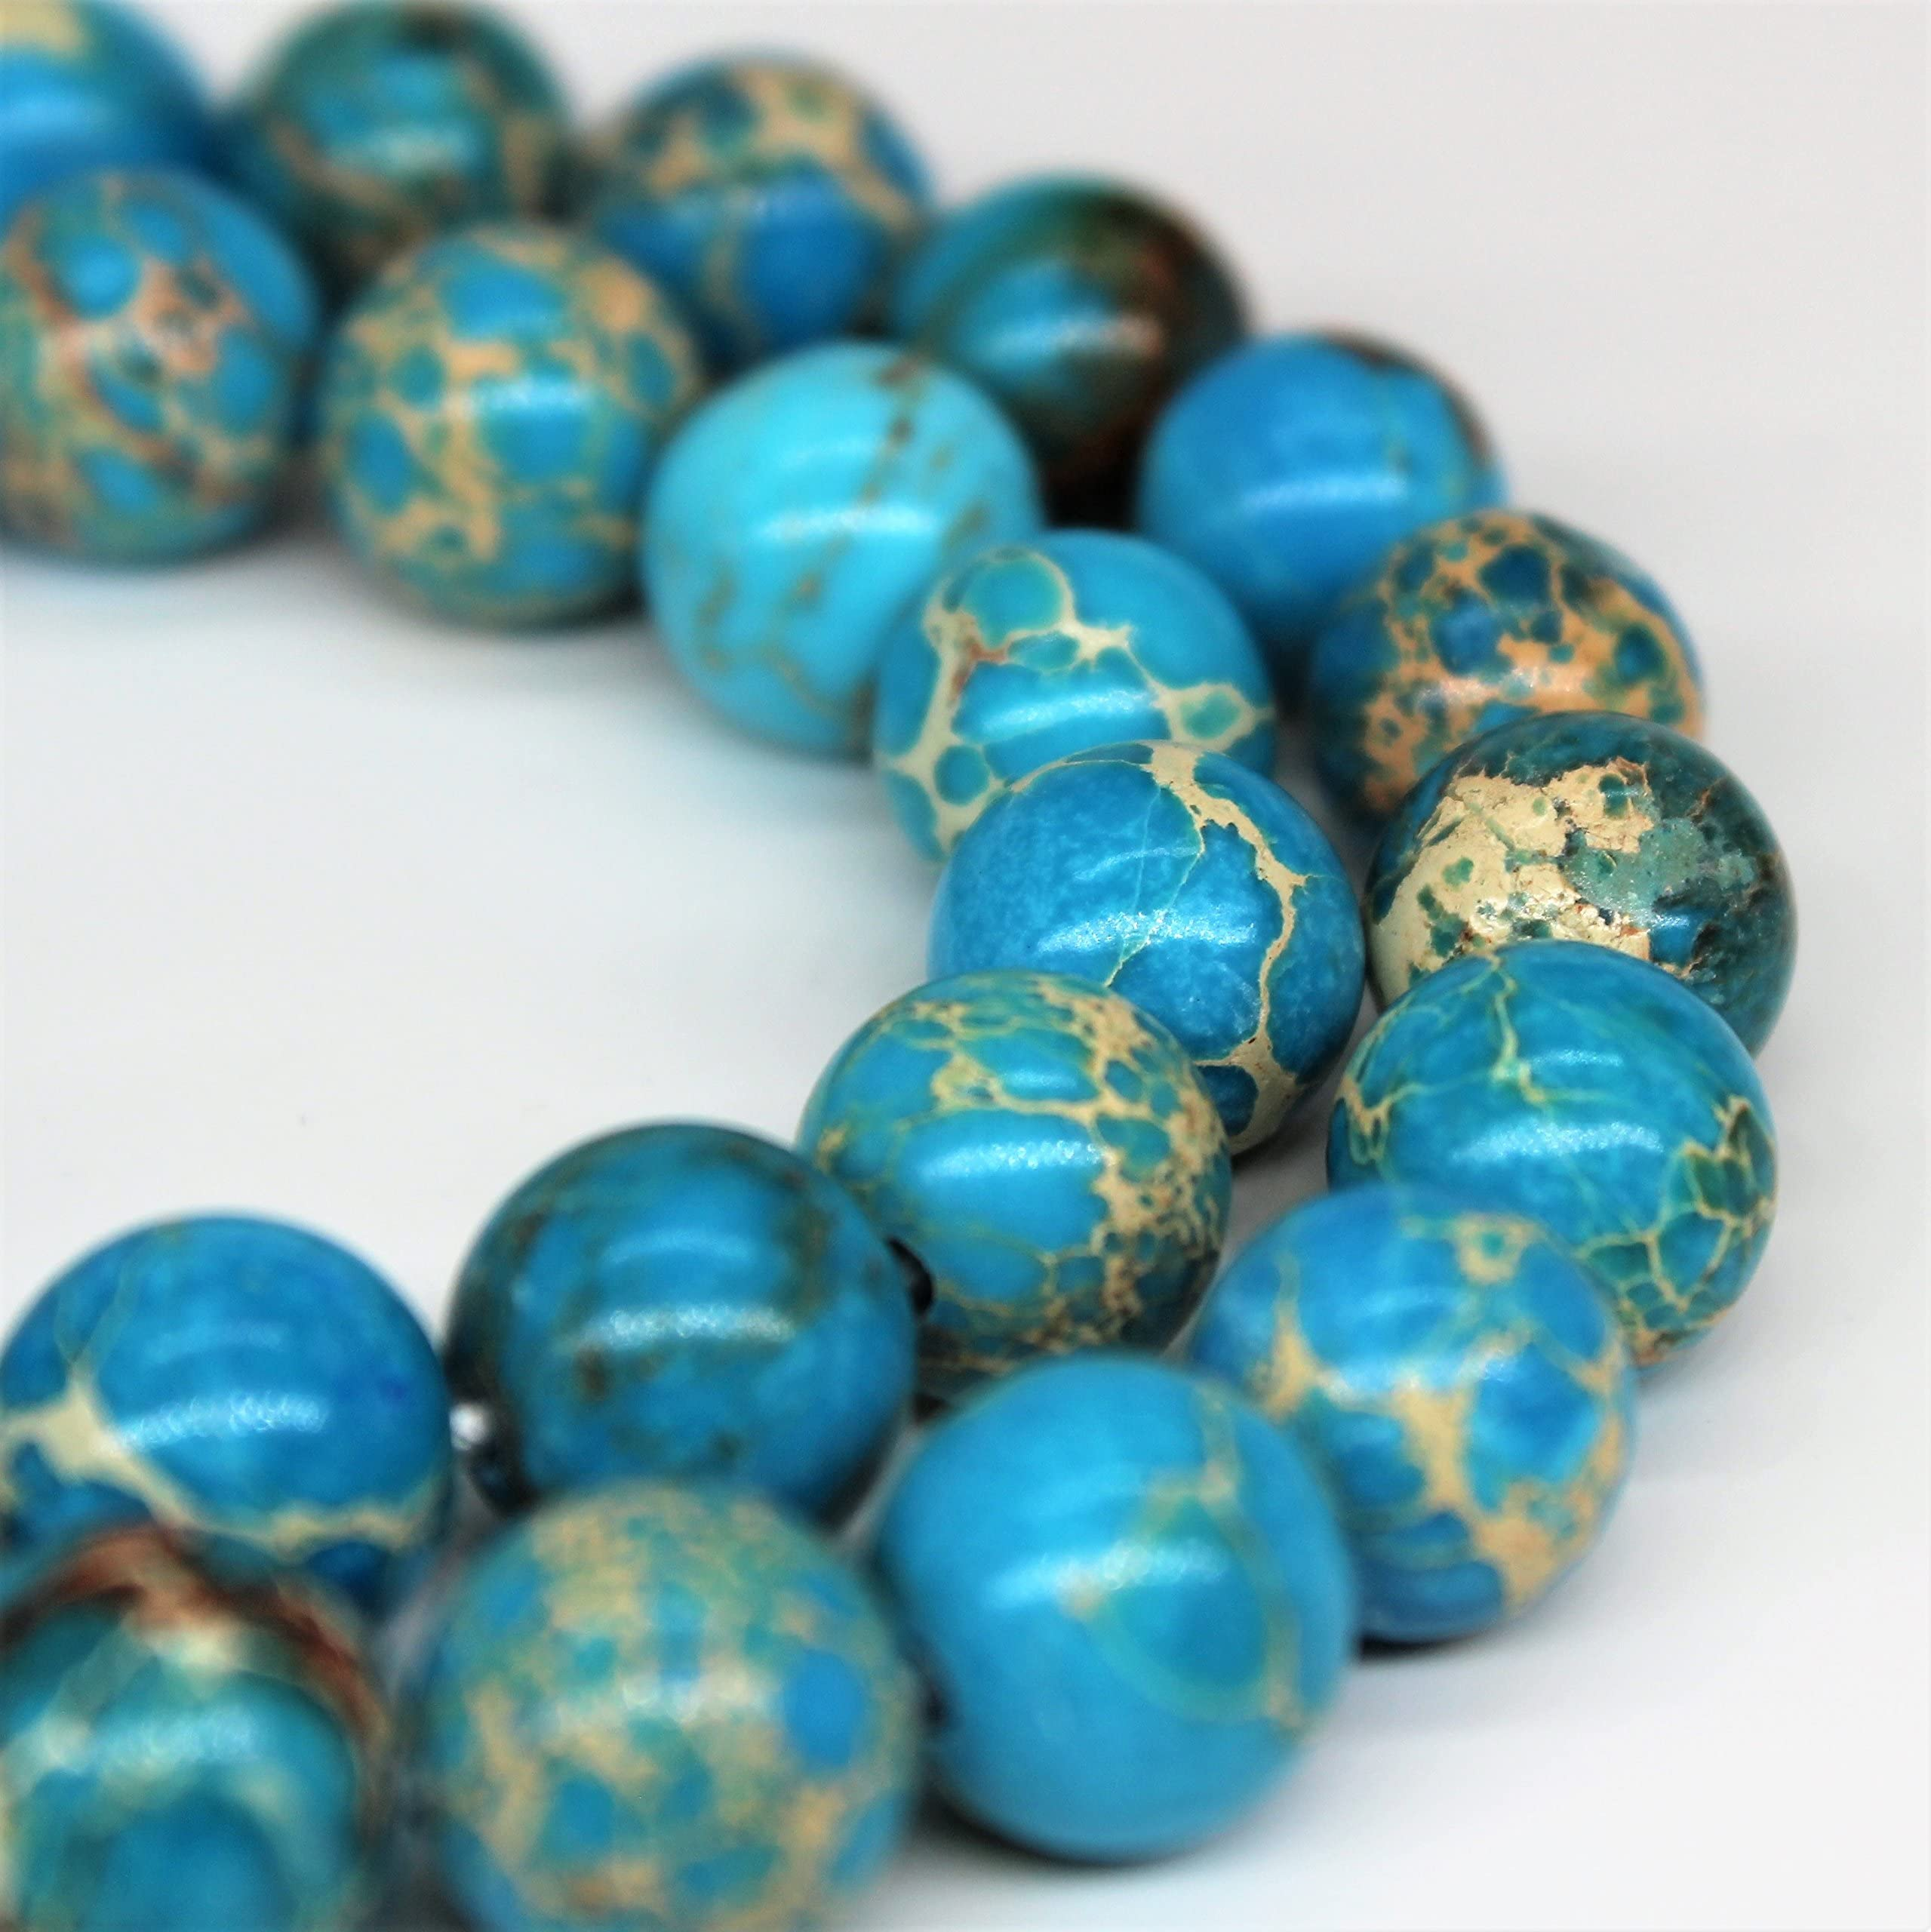 6 mm round aqua colored jasper beads